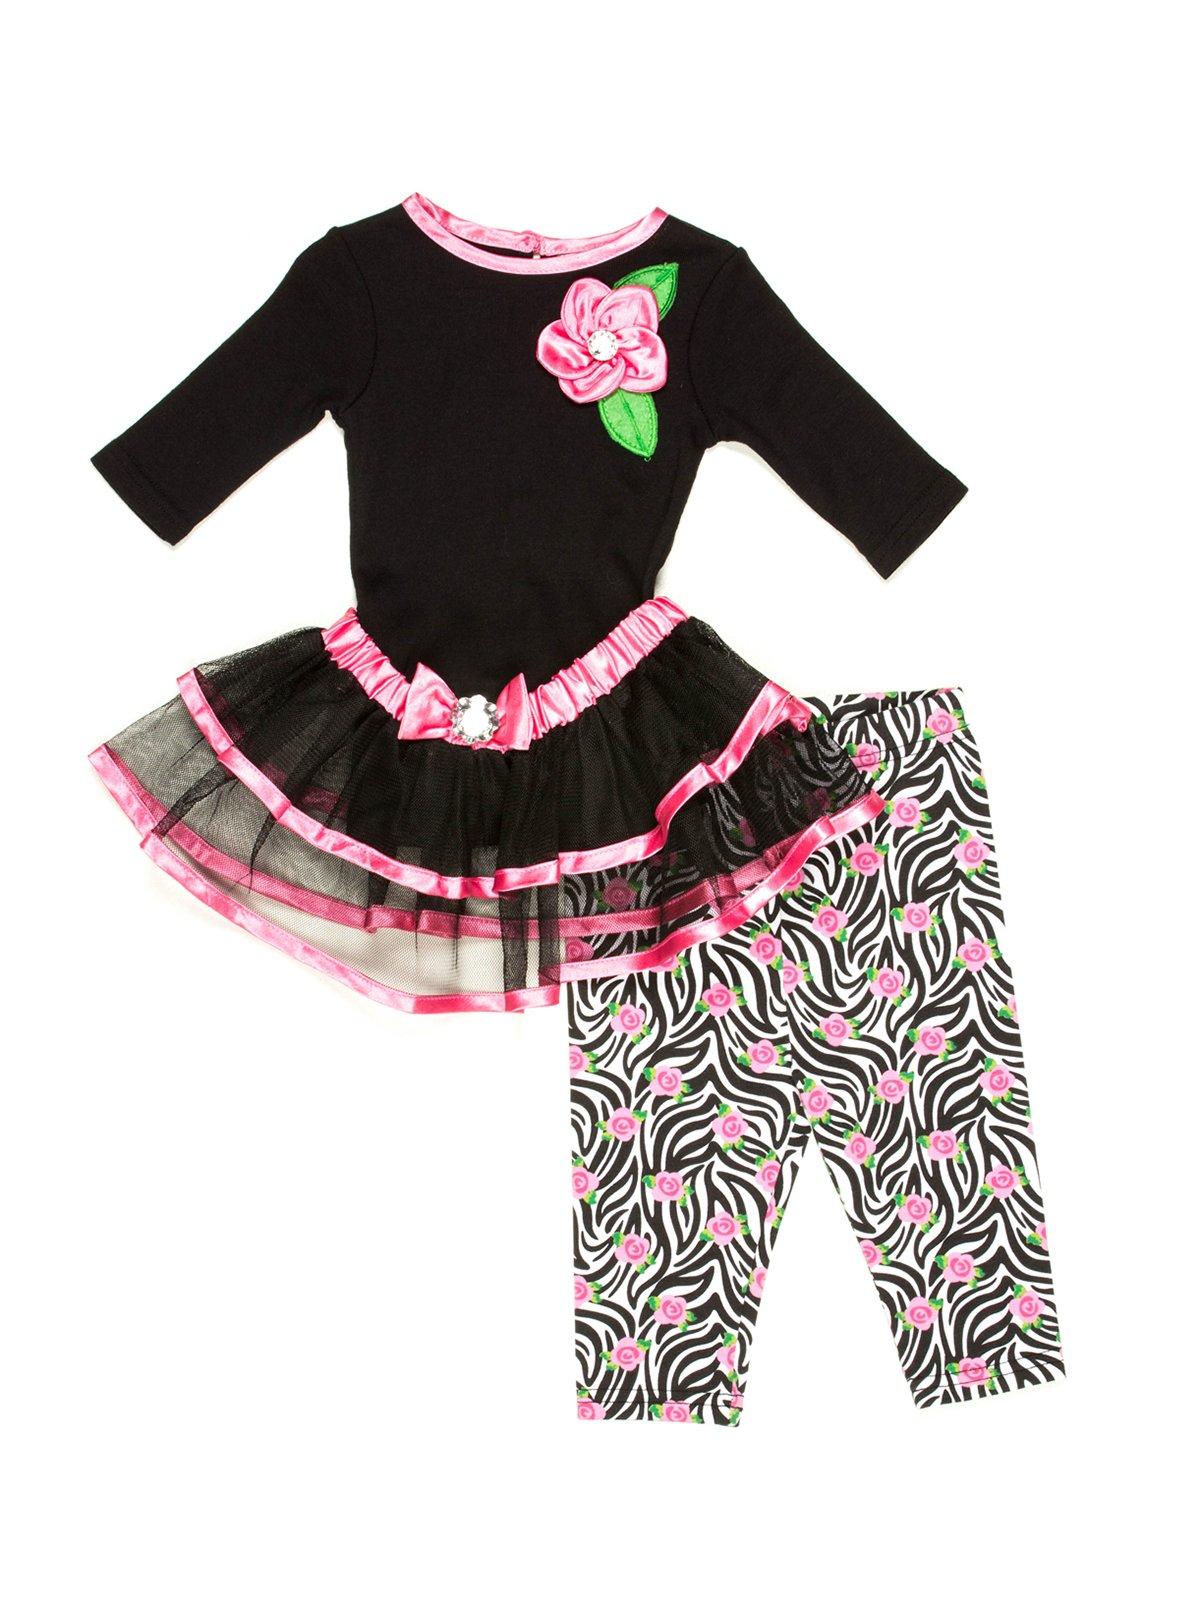 Комплект: топ, юбка и леггинсы | 502999